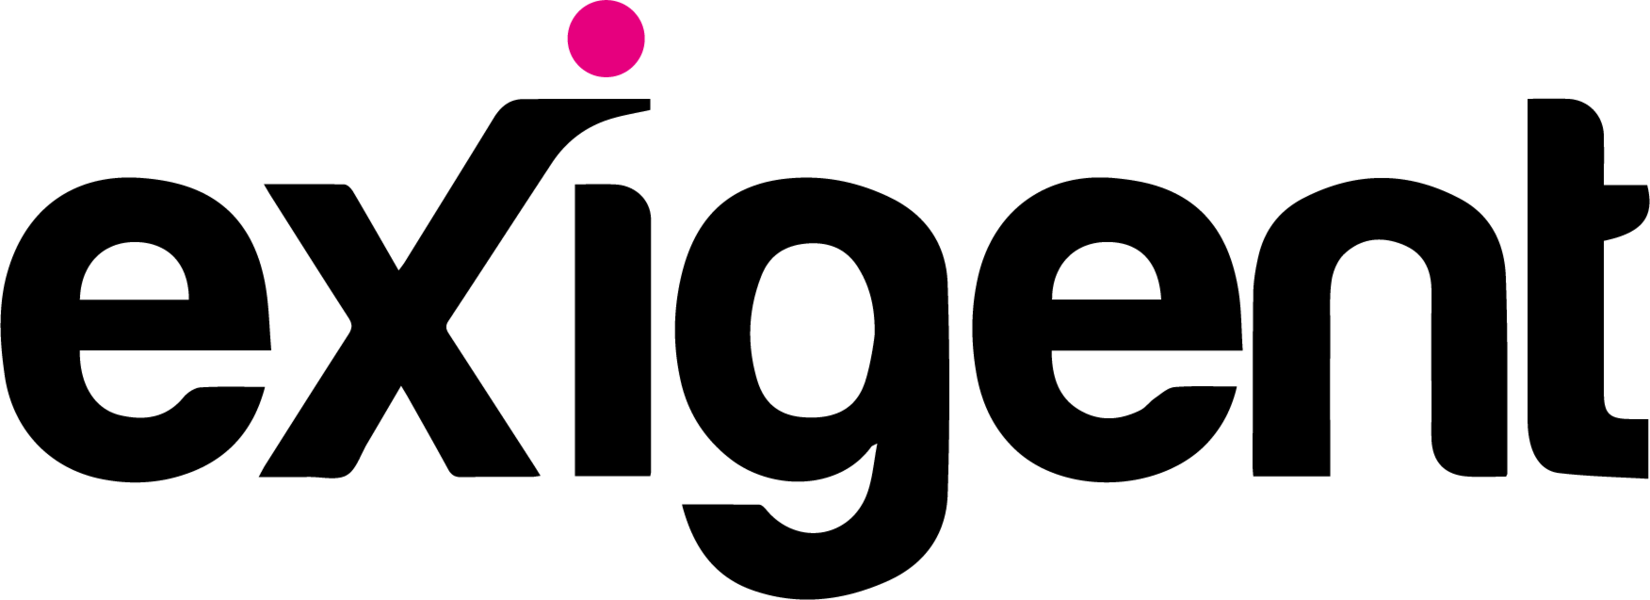 Exigent logo